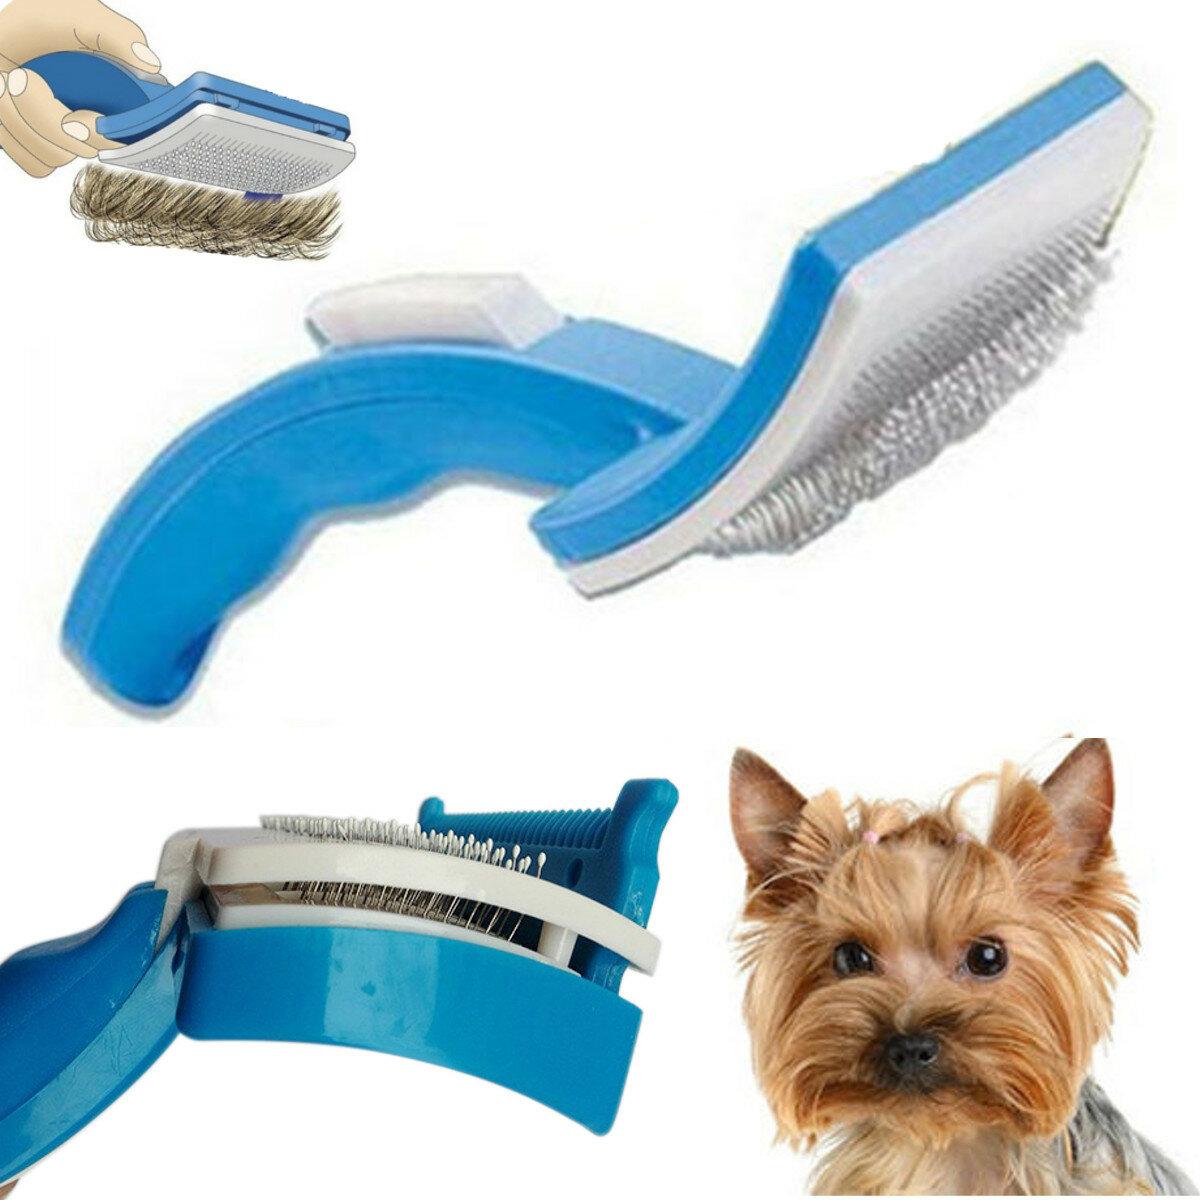 Pet Dog Cat Grooming Self Cleaning Pet Brush Comb Hair Fur Trimmer Shedding Tool